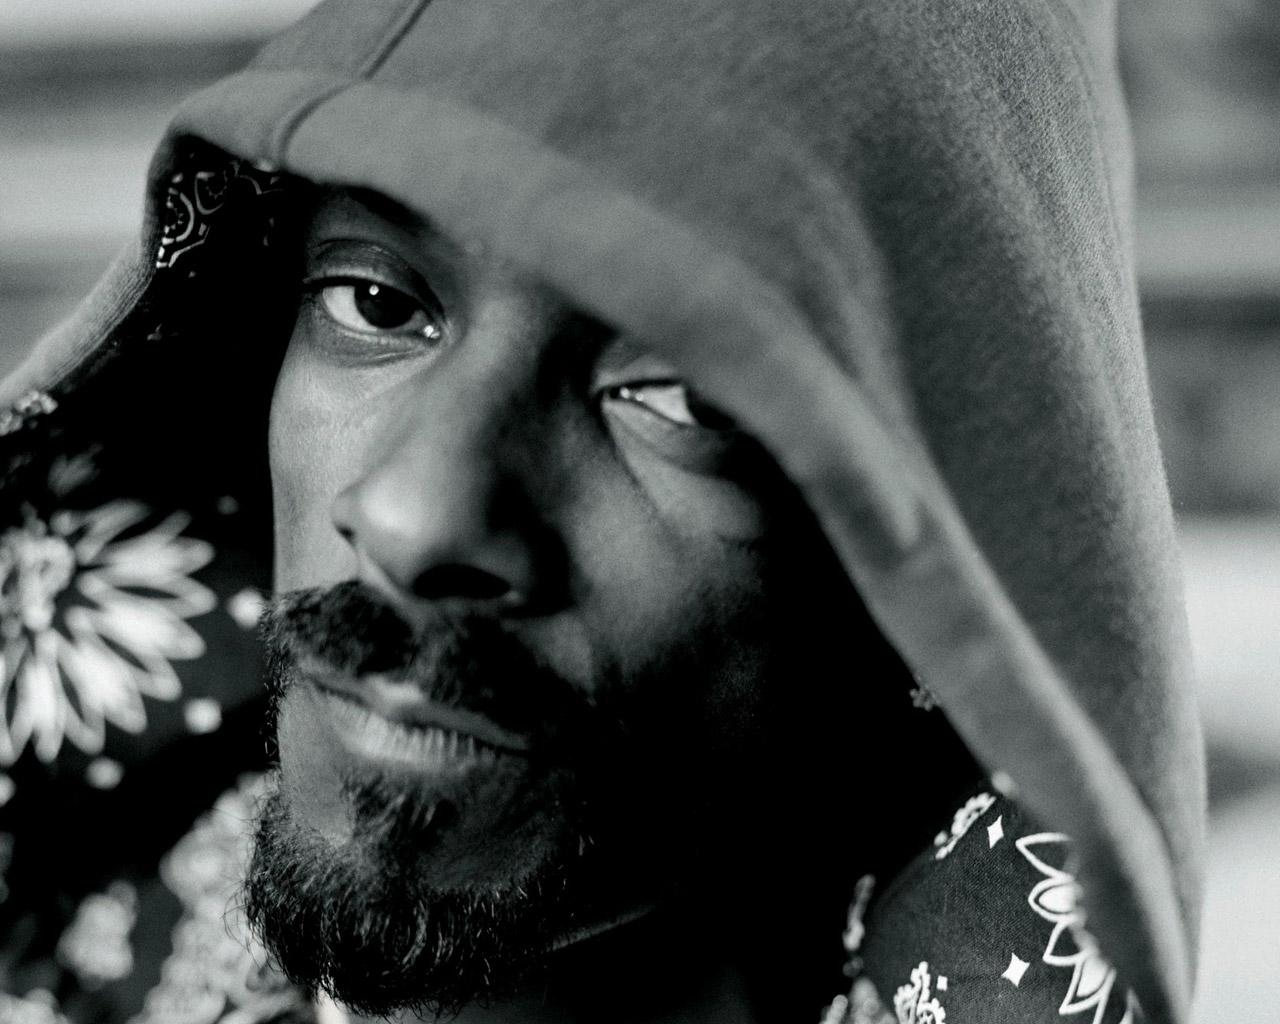 Snoop Dogg Blasts Kim Kardashian [VIDEO]